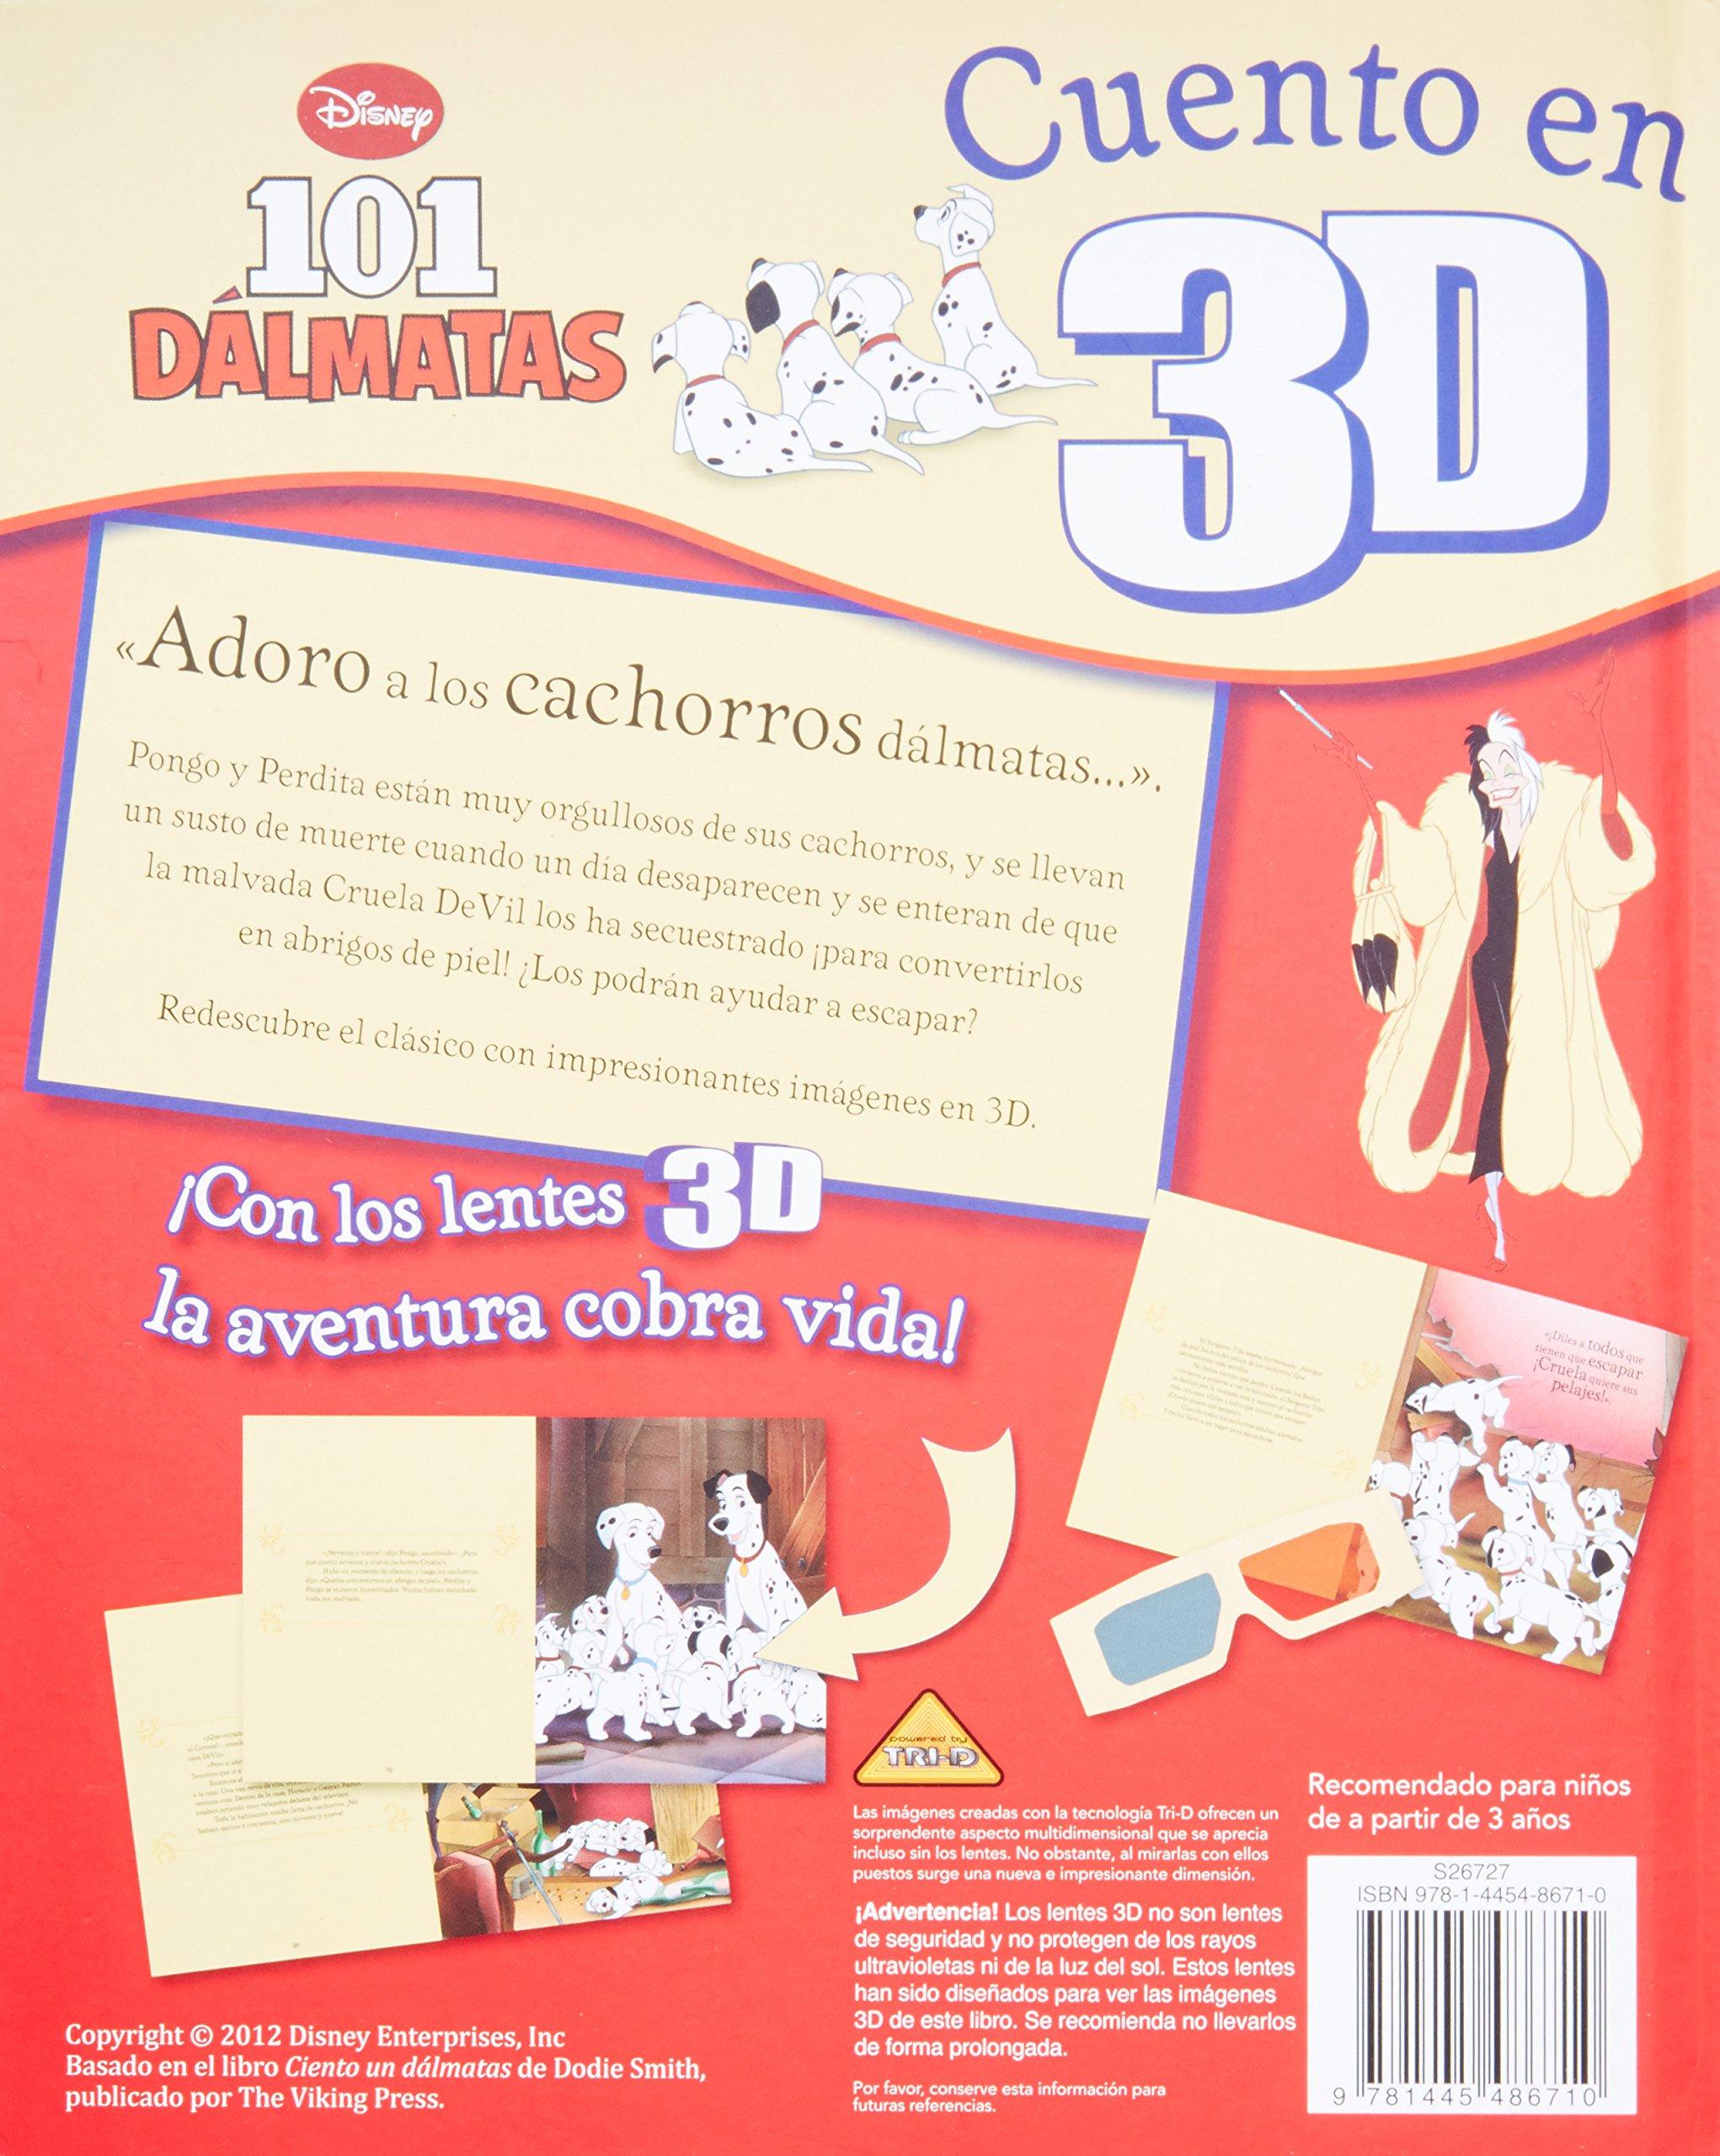 Disney 3D Cuento: 101 Dalmatians (Spanish Edition): Parragon Books: 9781445486710: Amazon.com: Books